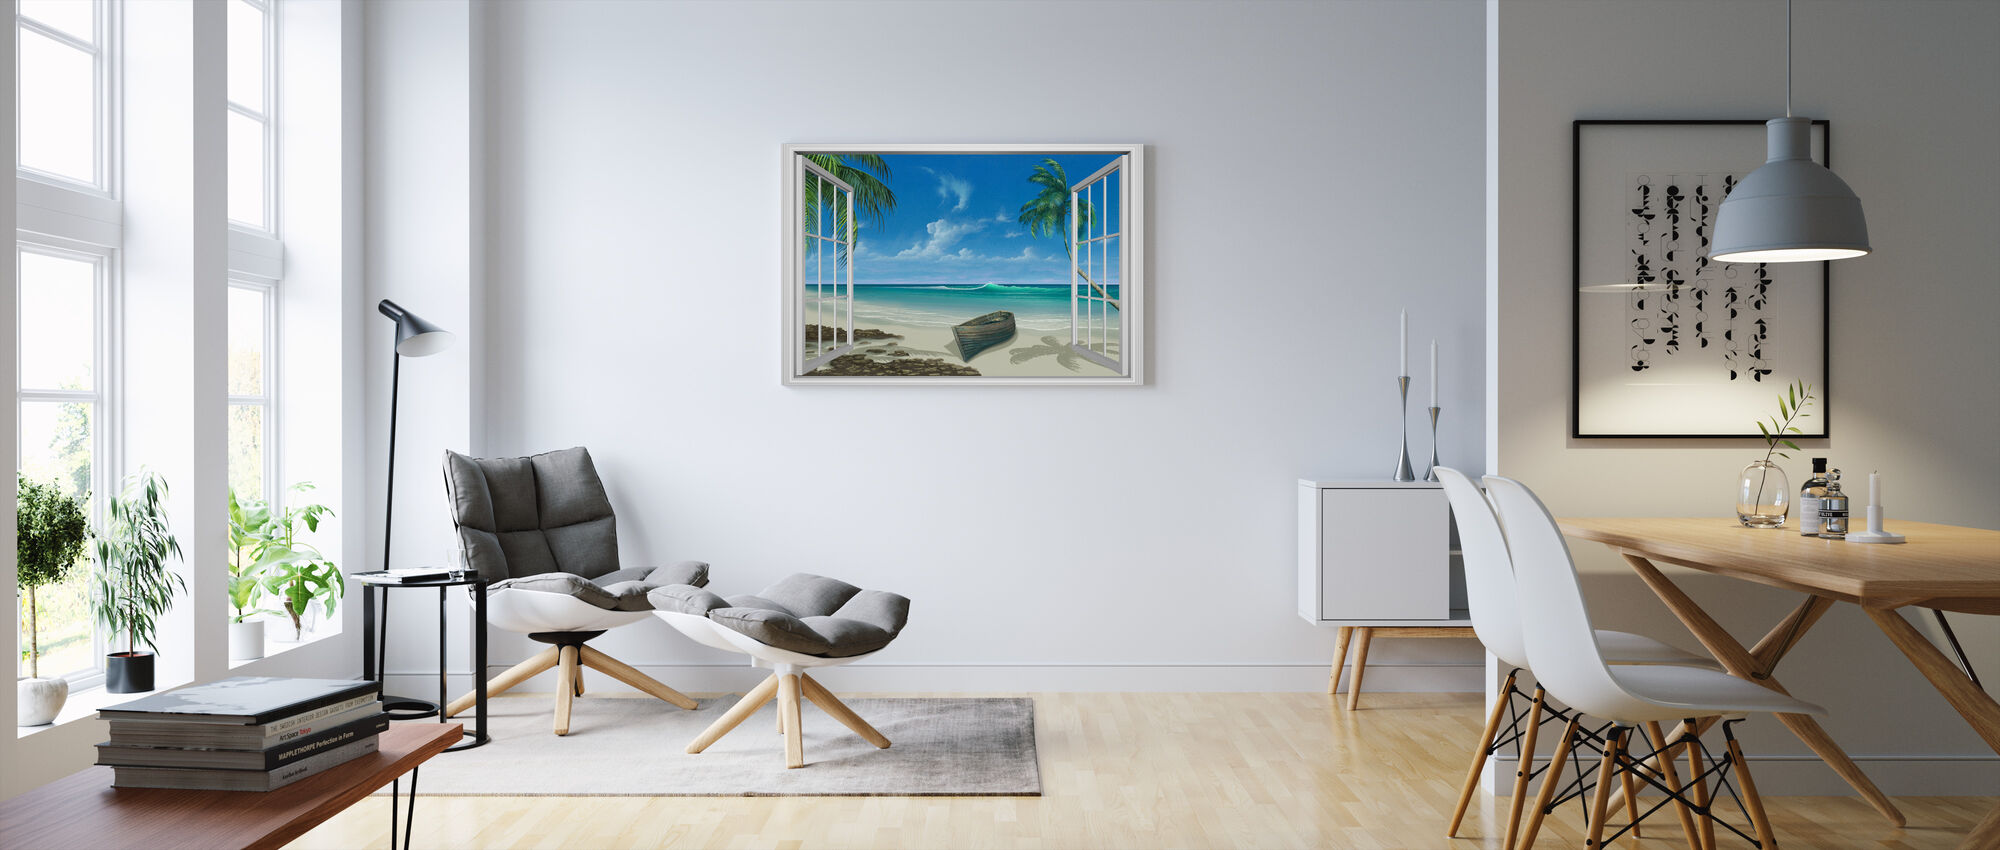 Flykten till paradiset - Canvastavla - Vardagsrum